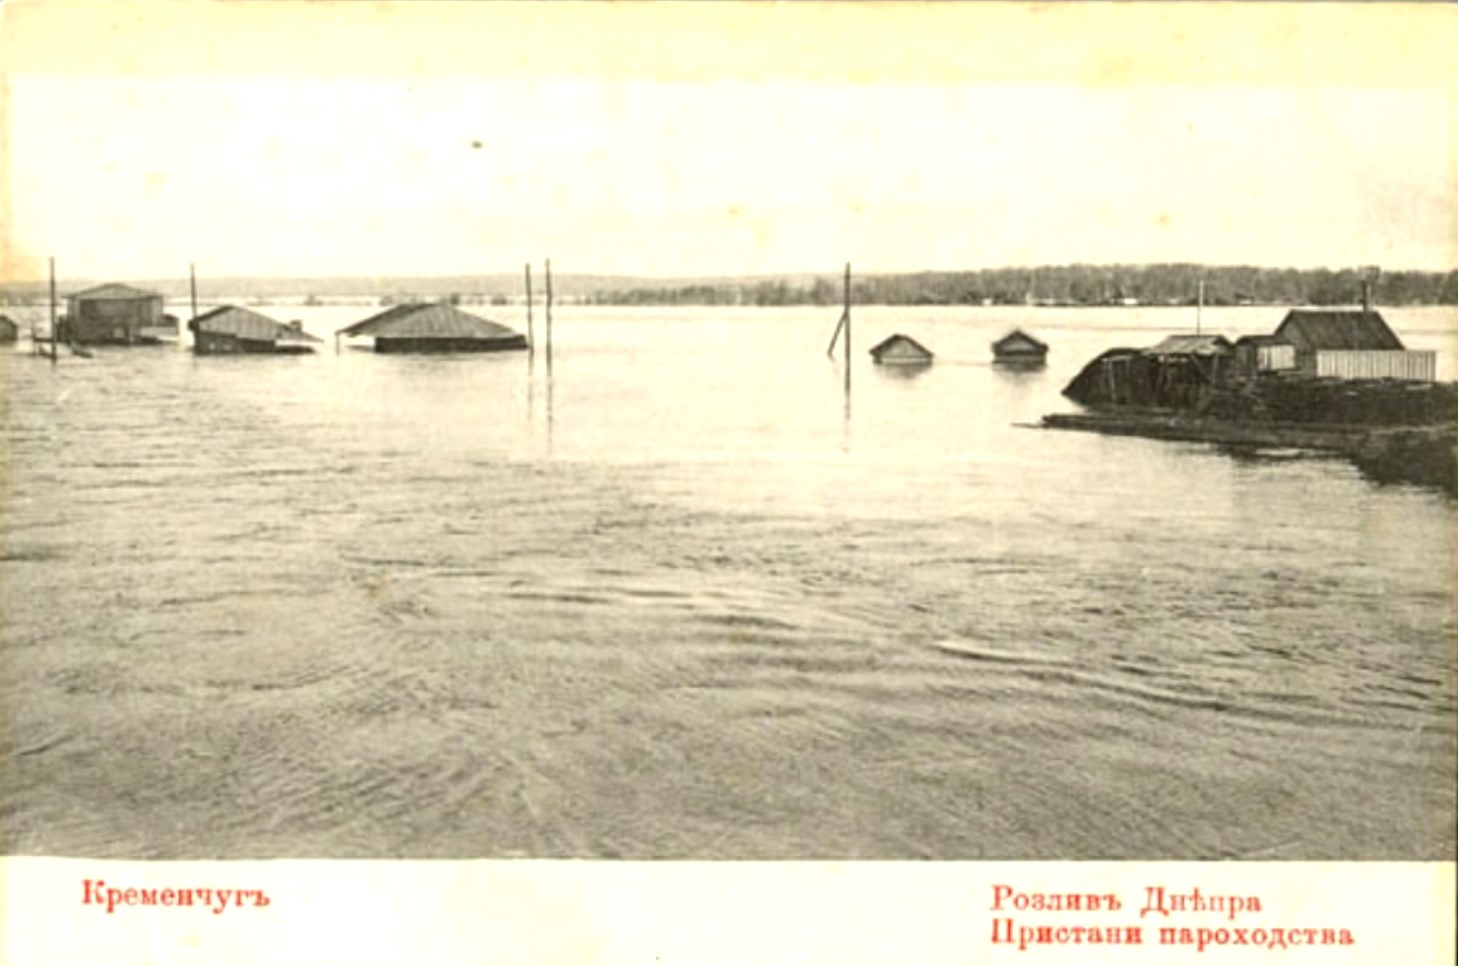 Разлив Днепра Пристани пароходства 1903